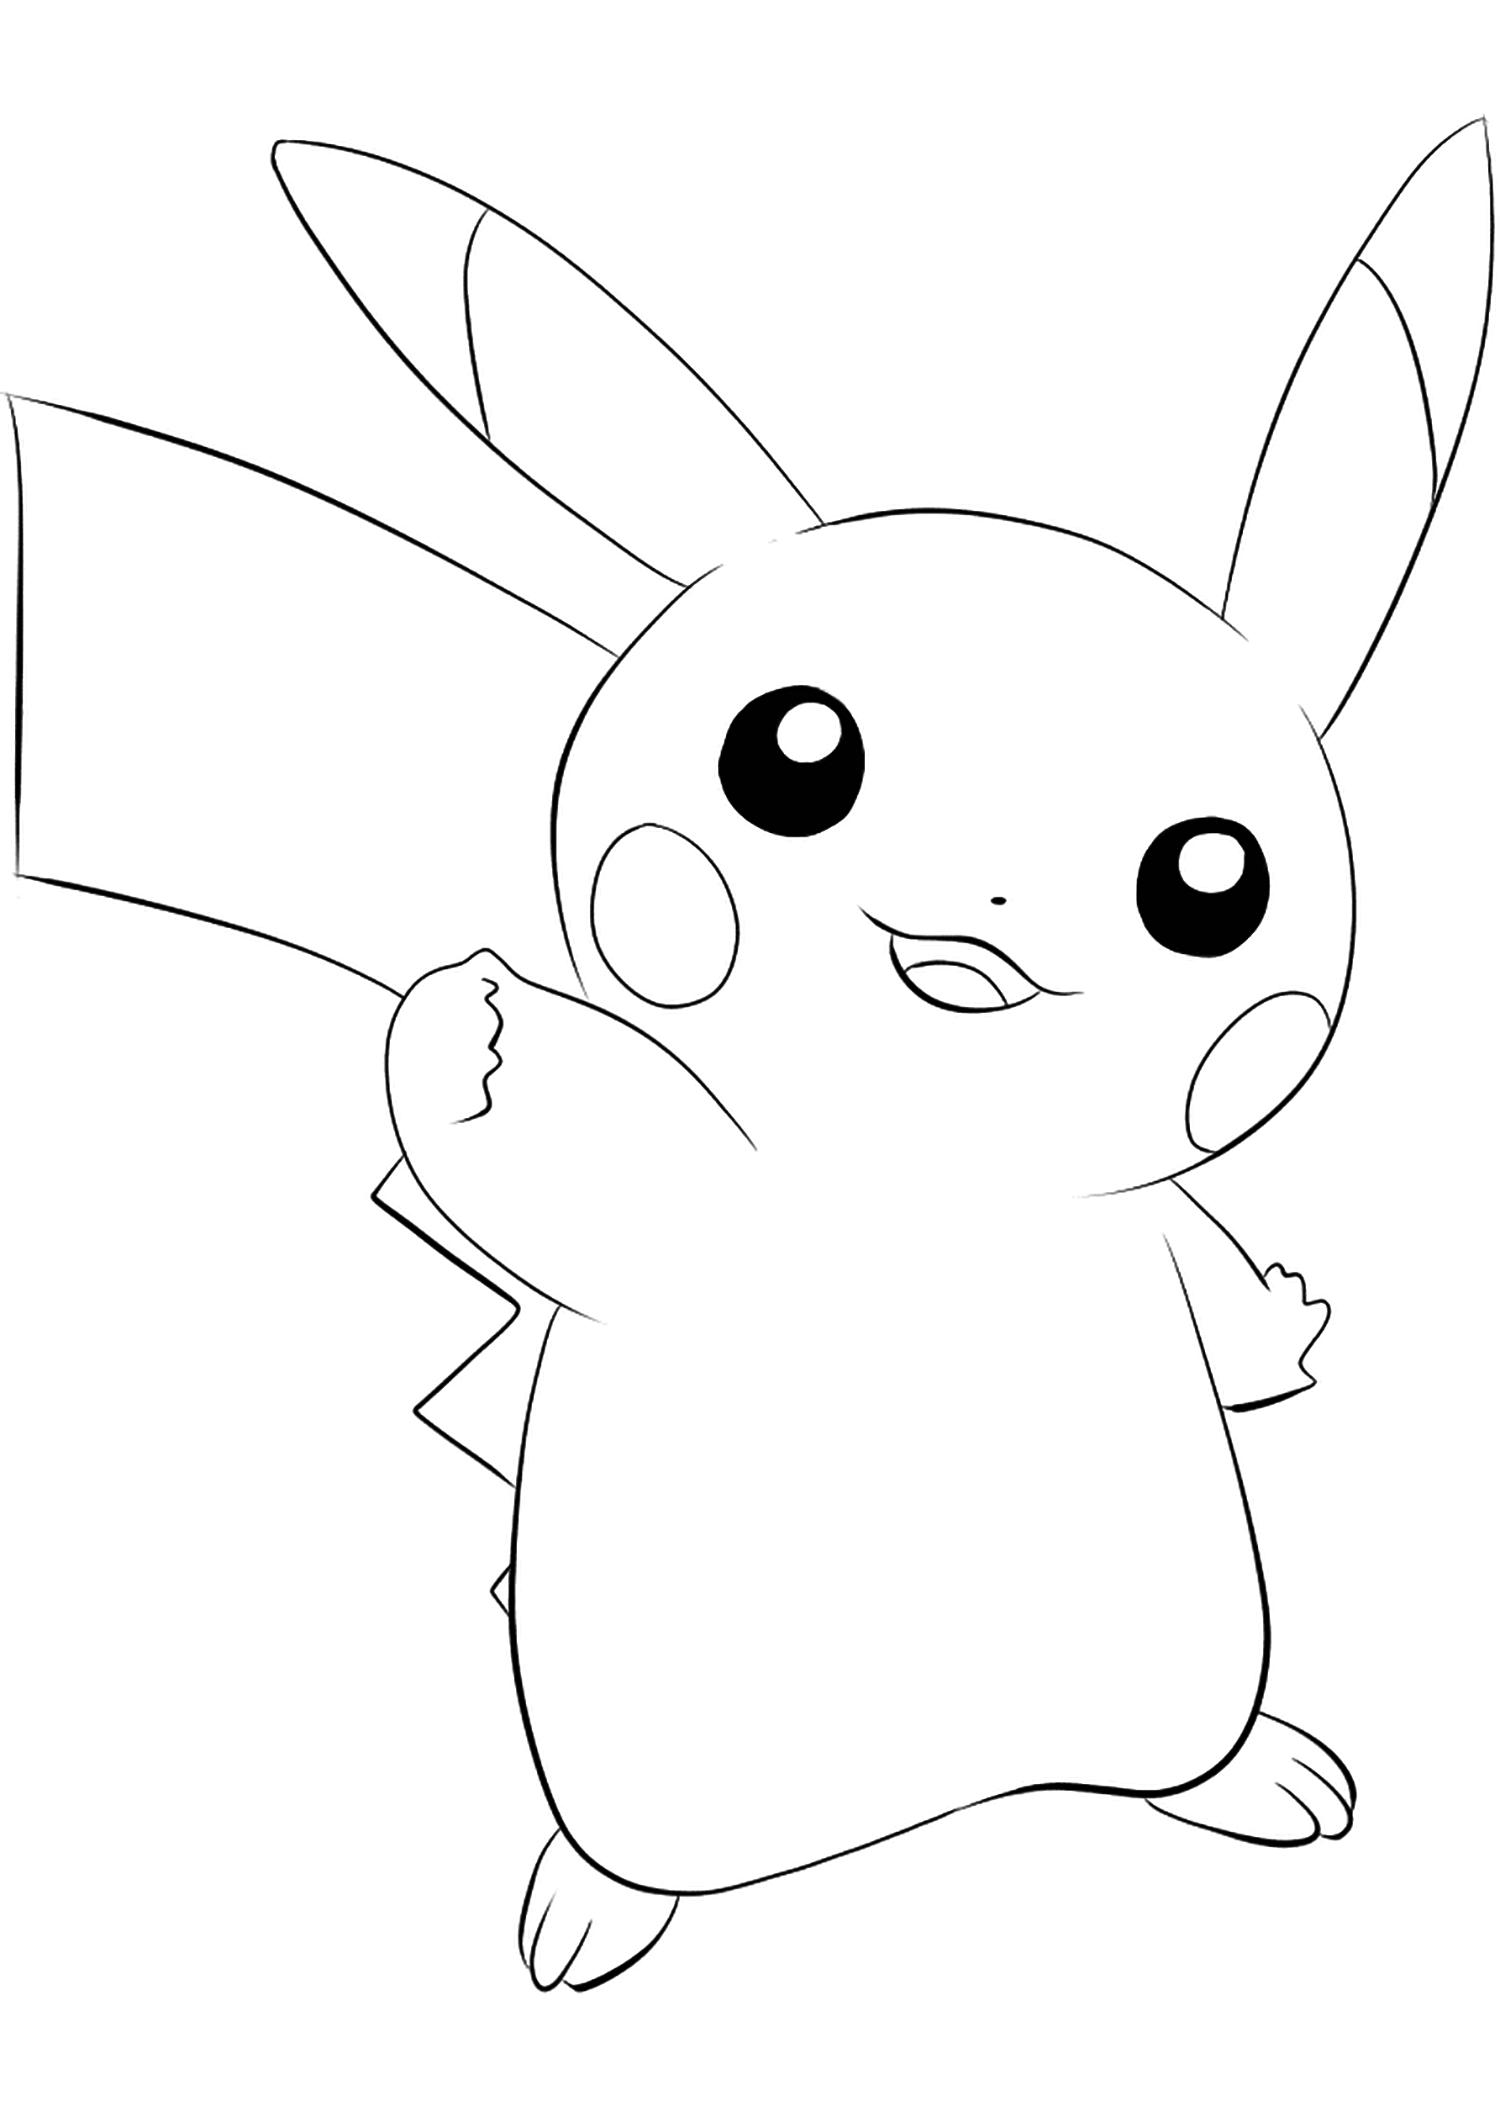 Pikachu (No.25)Coloriage de Pikachu (Pikachu), Pokémon de Génération I, de type : ElectrikPermission: All rights reserved © Pokemon company and Ken Sugimori.